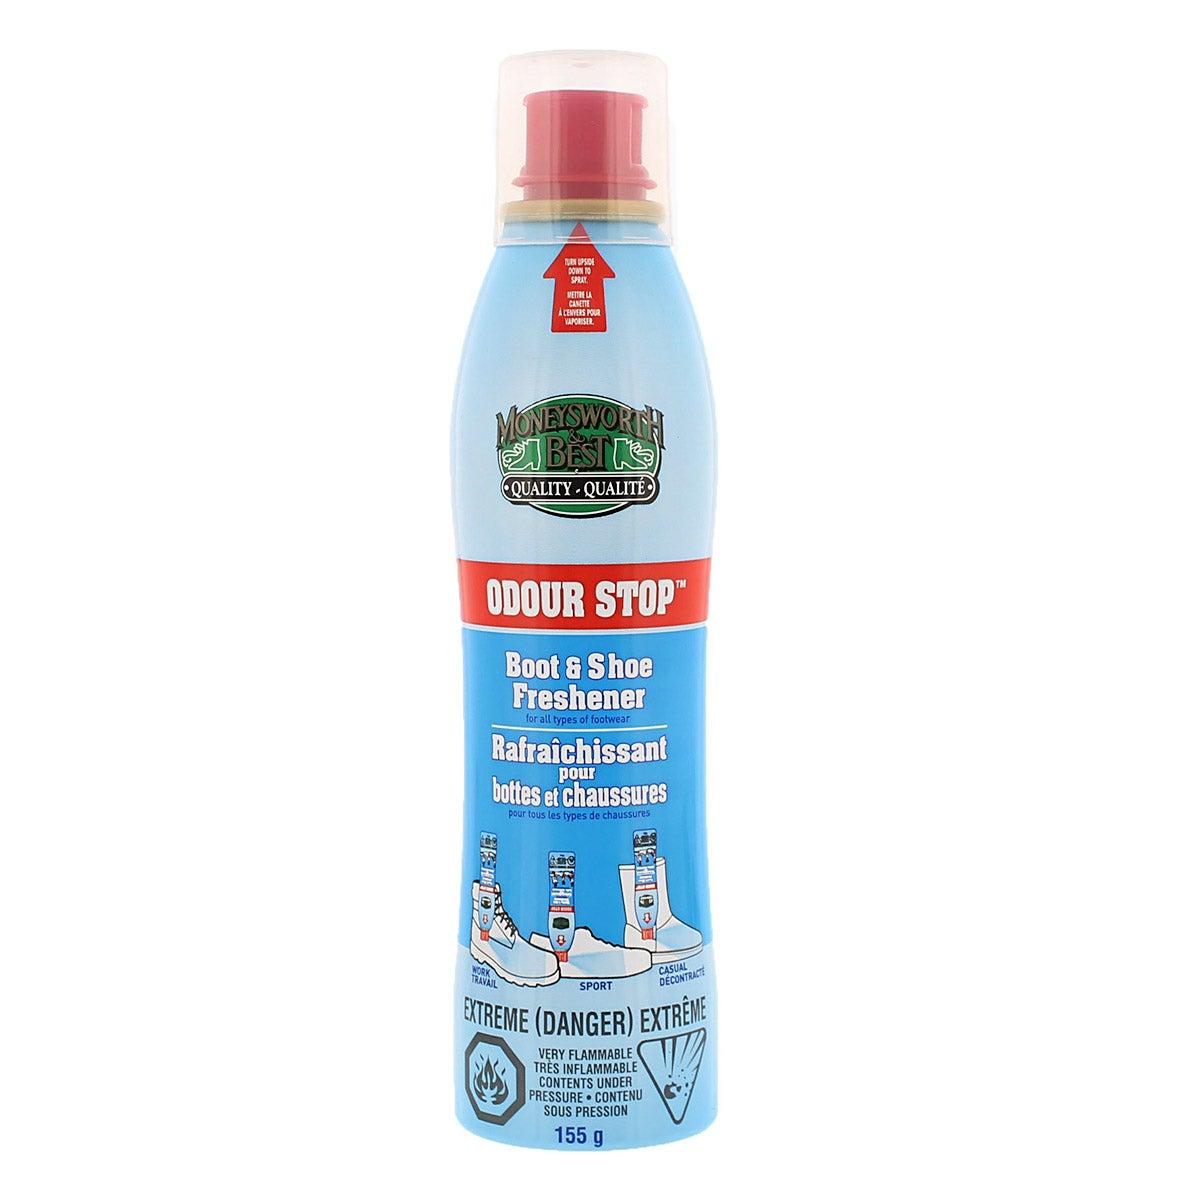 Shoe Care Odor Stop Control Scented Spray